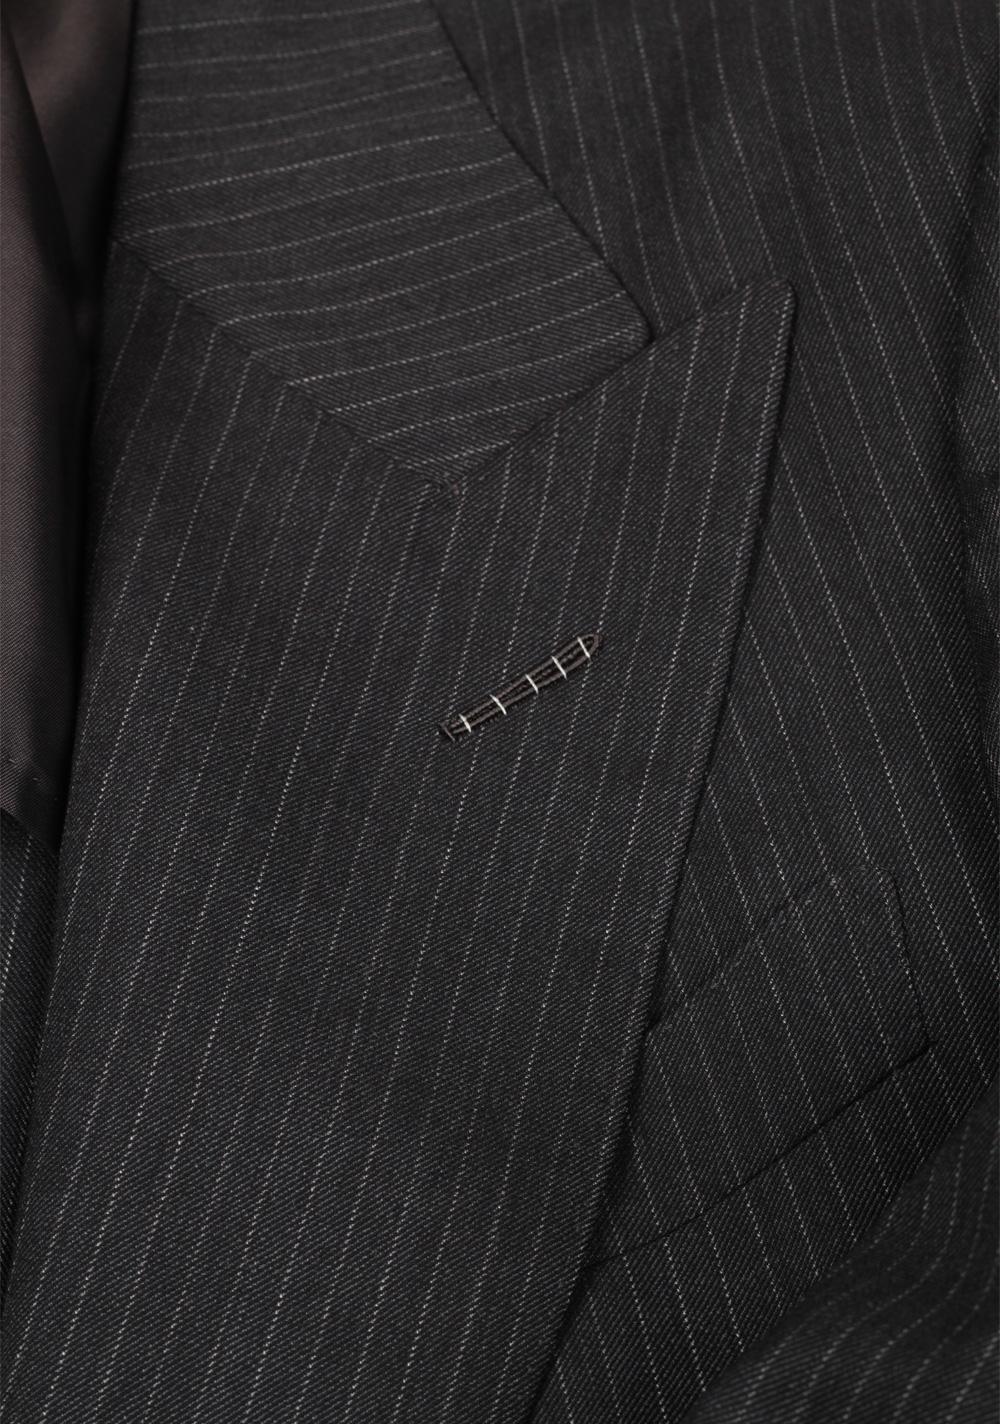 TOM FORD Atticus Gray Striped Suit Size 46 / 36R U.S.   Costume Limité